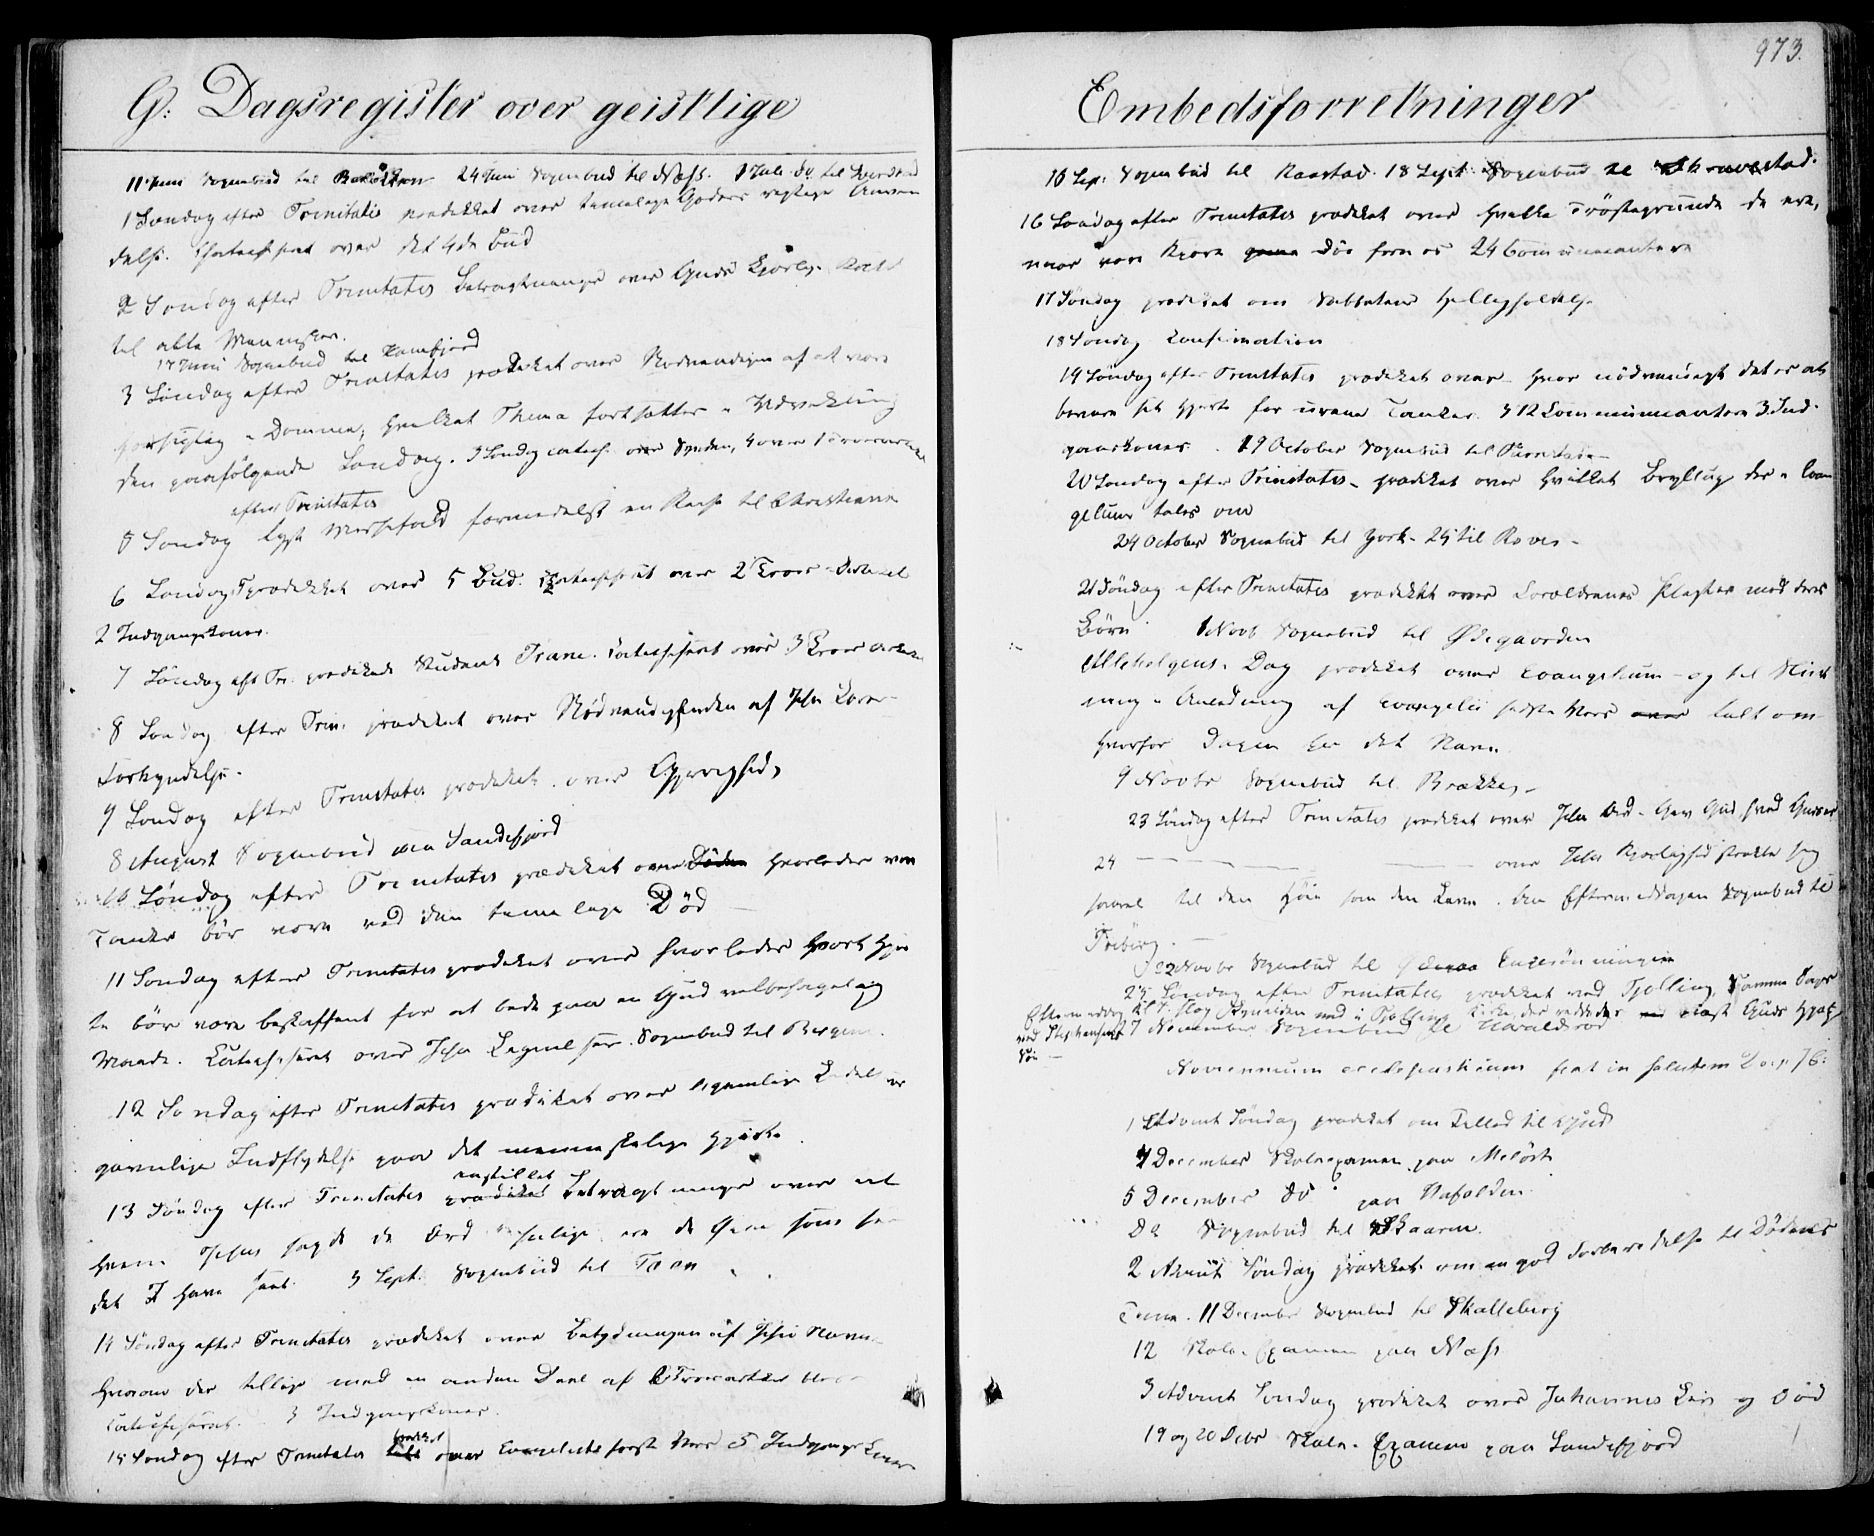 SAKO, Sandar kirkebøker, F/Fa/L0005: Parish register (official) no. 5, 1832-1847, p. 972-973